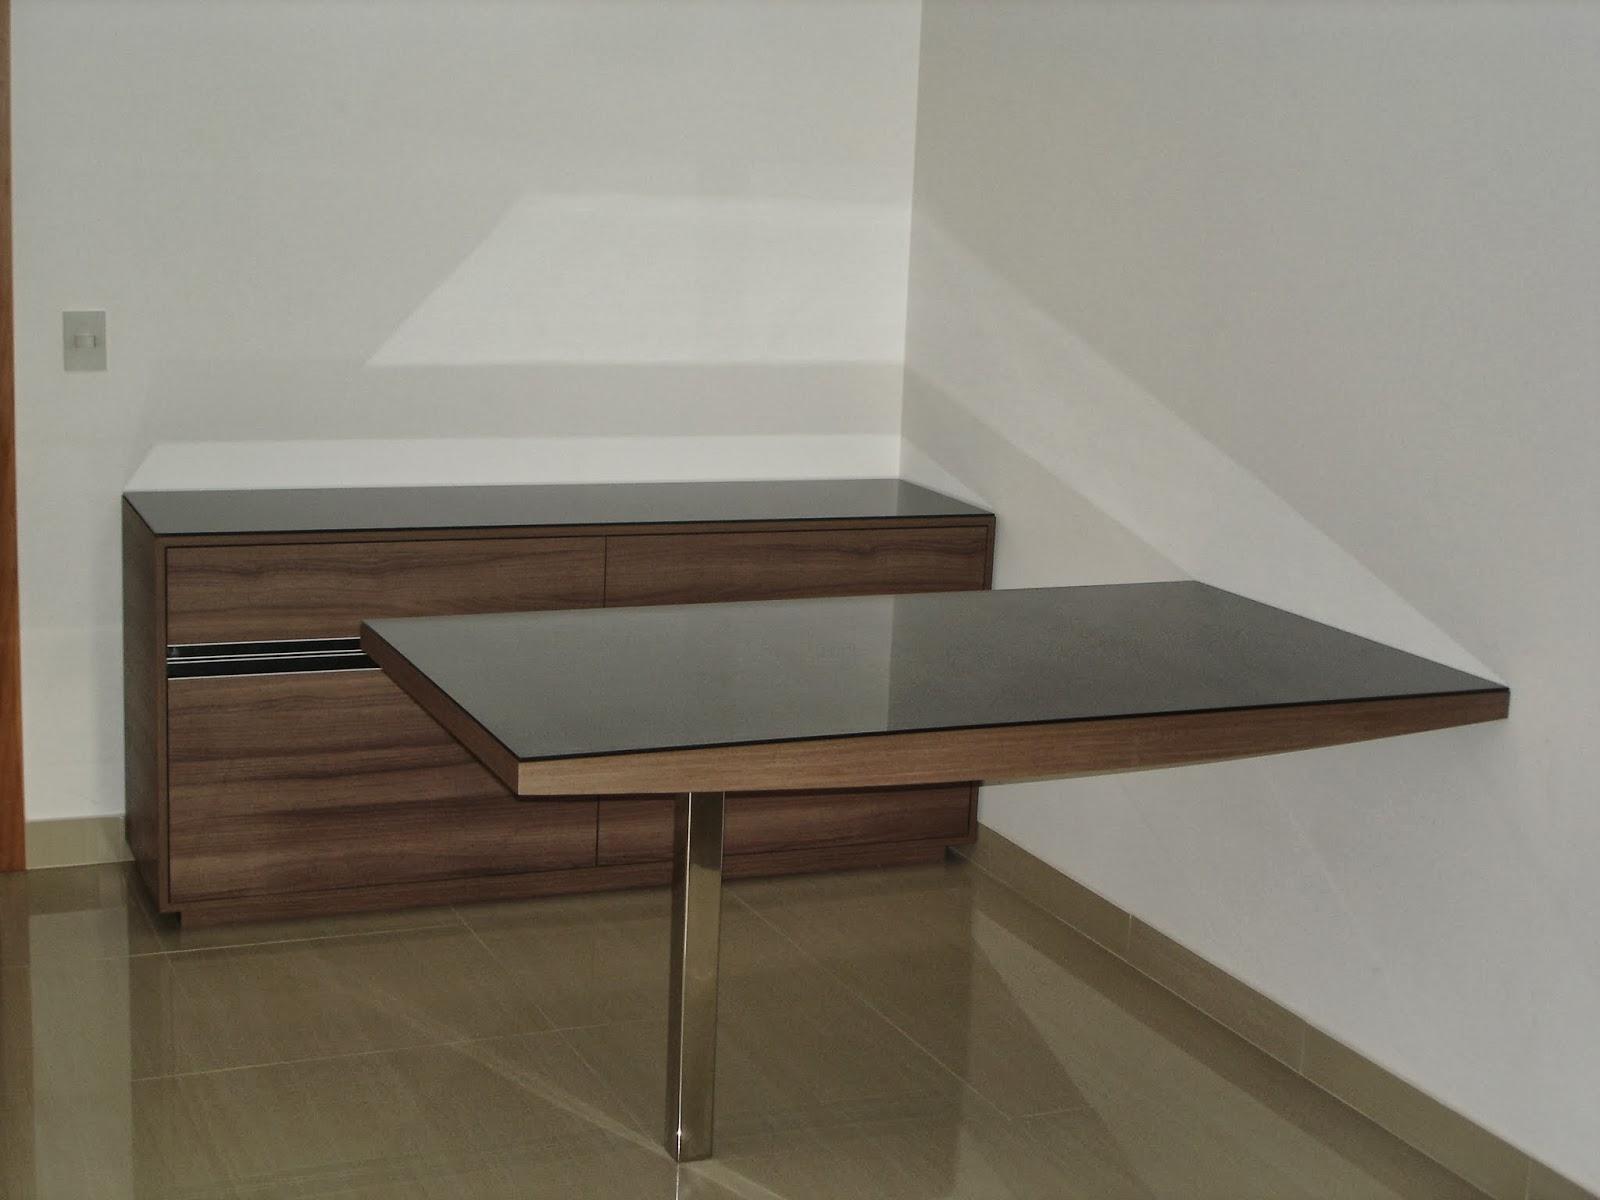 Mesa Fixa Parede ~ Belenetto Marcenaria Personalizada Sala de Jantar e Home Theater Neia Jardim da Penha